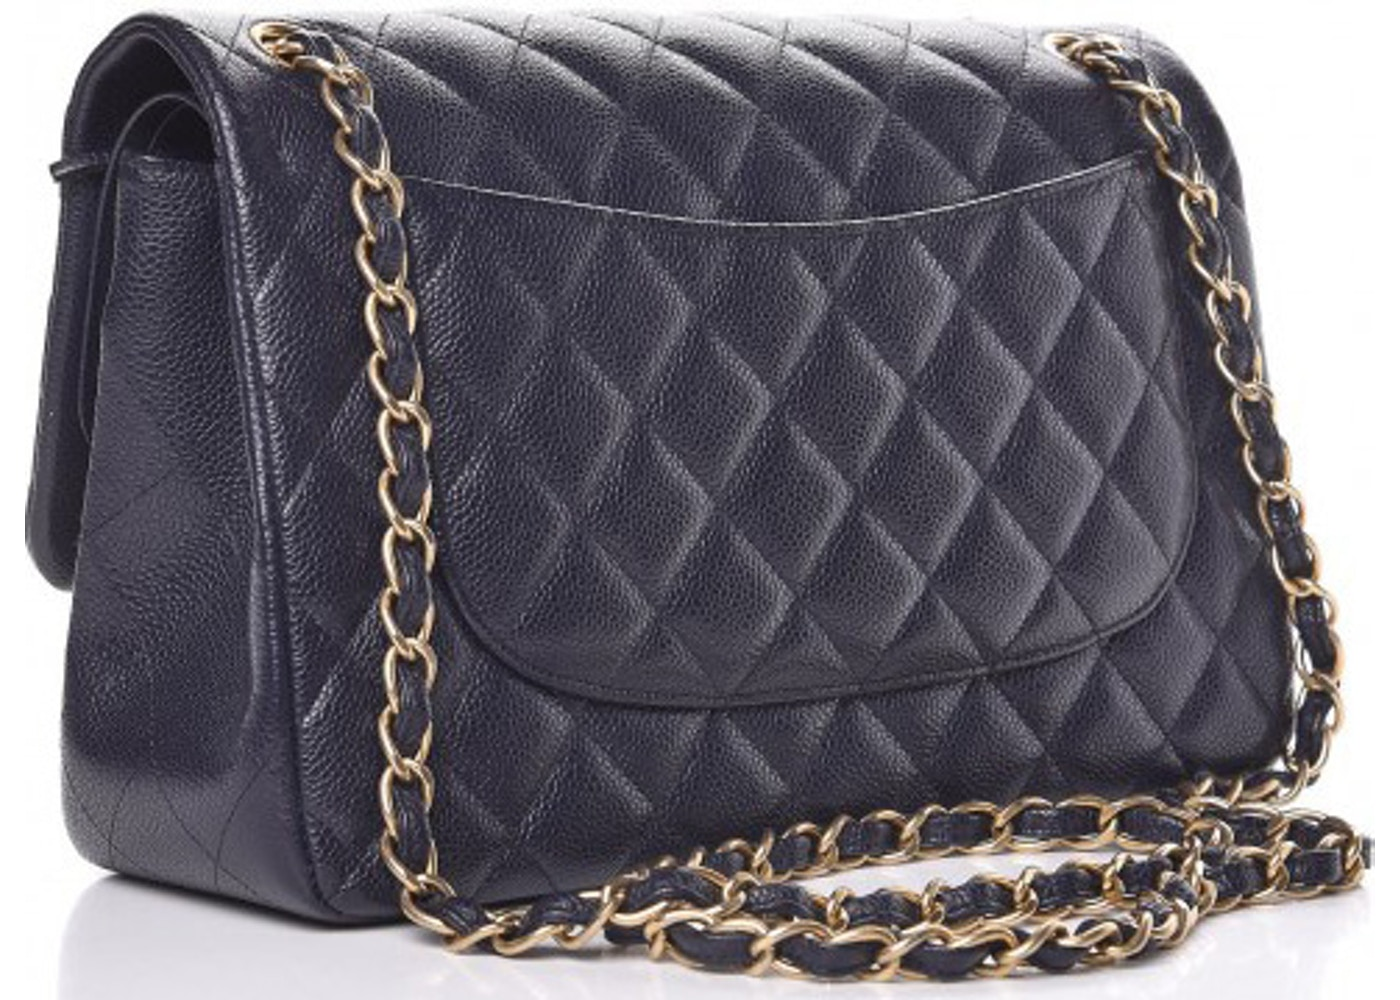 31426a0c56236 Chanel Classic Double Flap Caviar Jumbo Navy